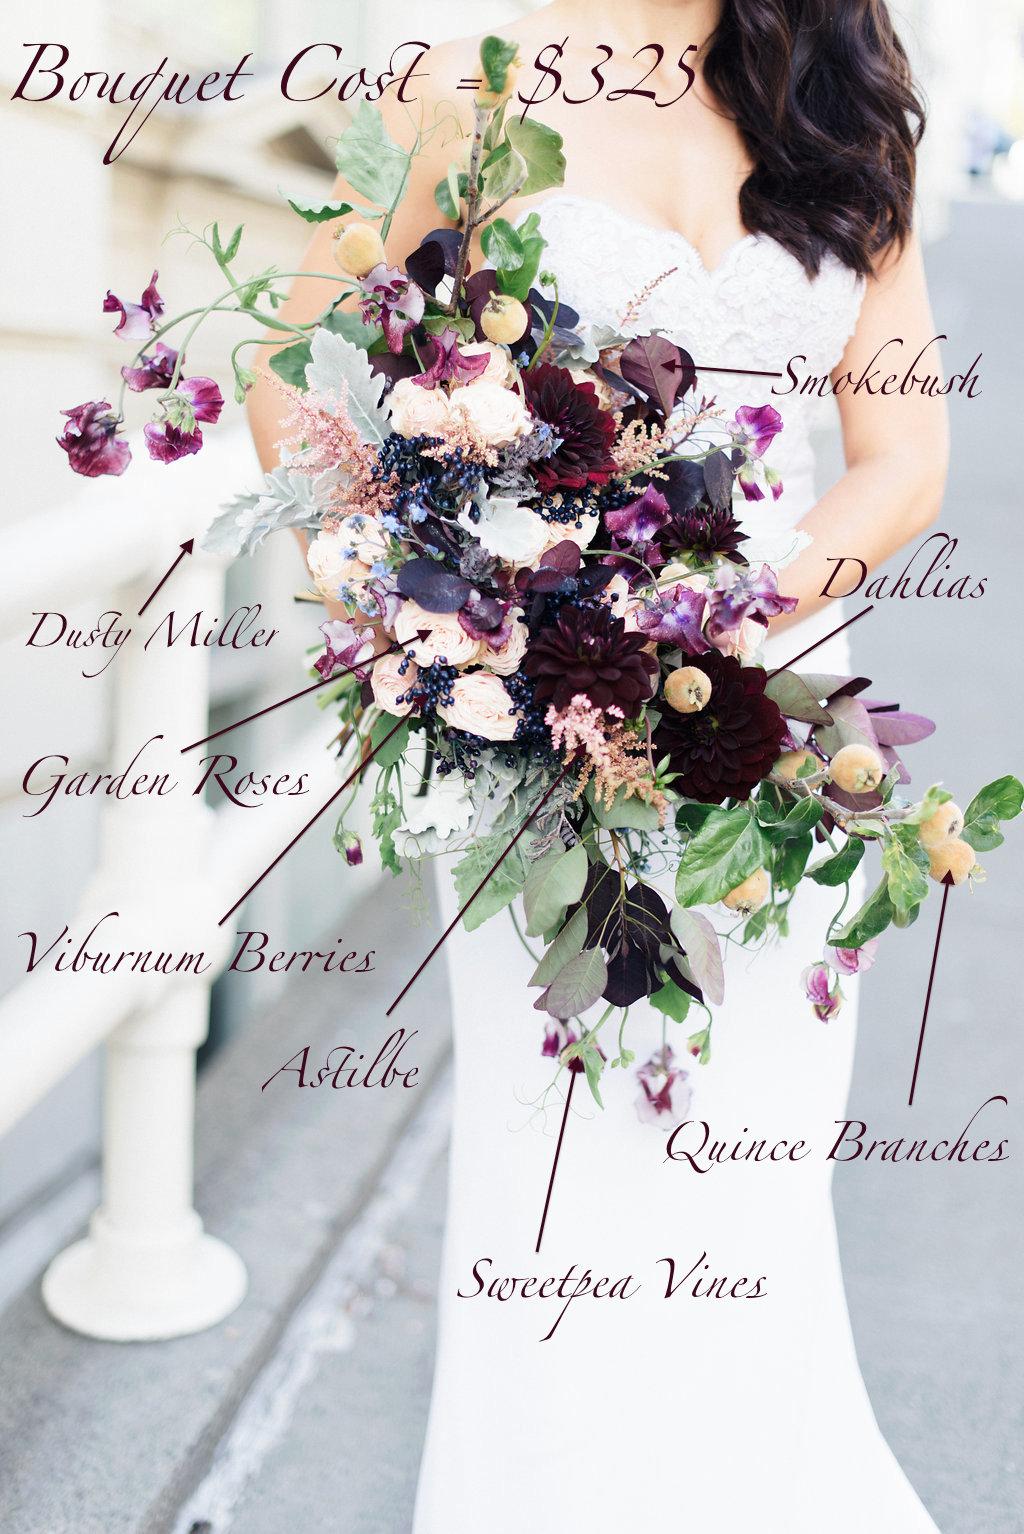 Burgundy dahlias, quince branches, clematis vines, roses - Bridal Bouquet Pricing: Fall dramatic plum bouquet recipe - Flora Nova Design Seattle